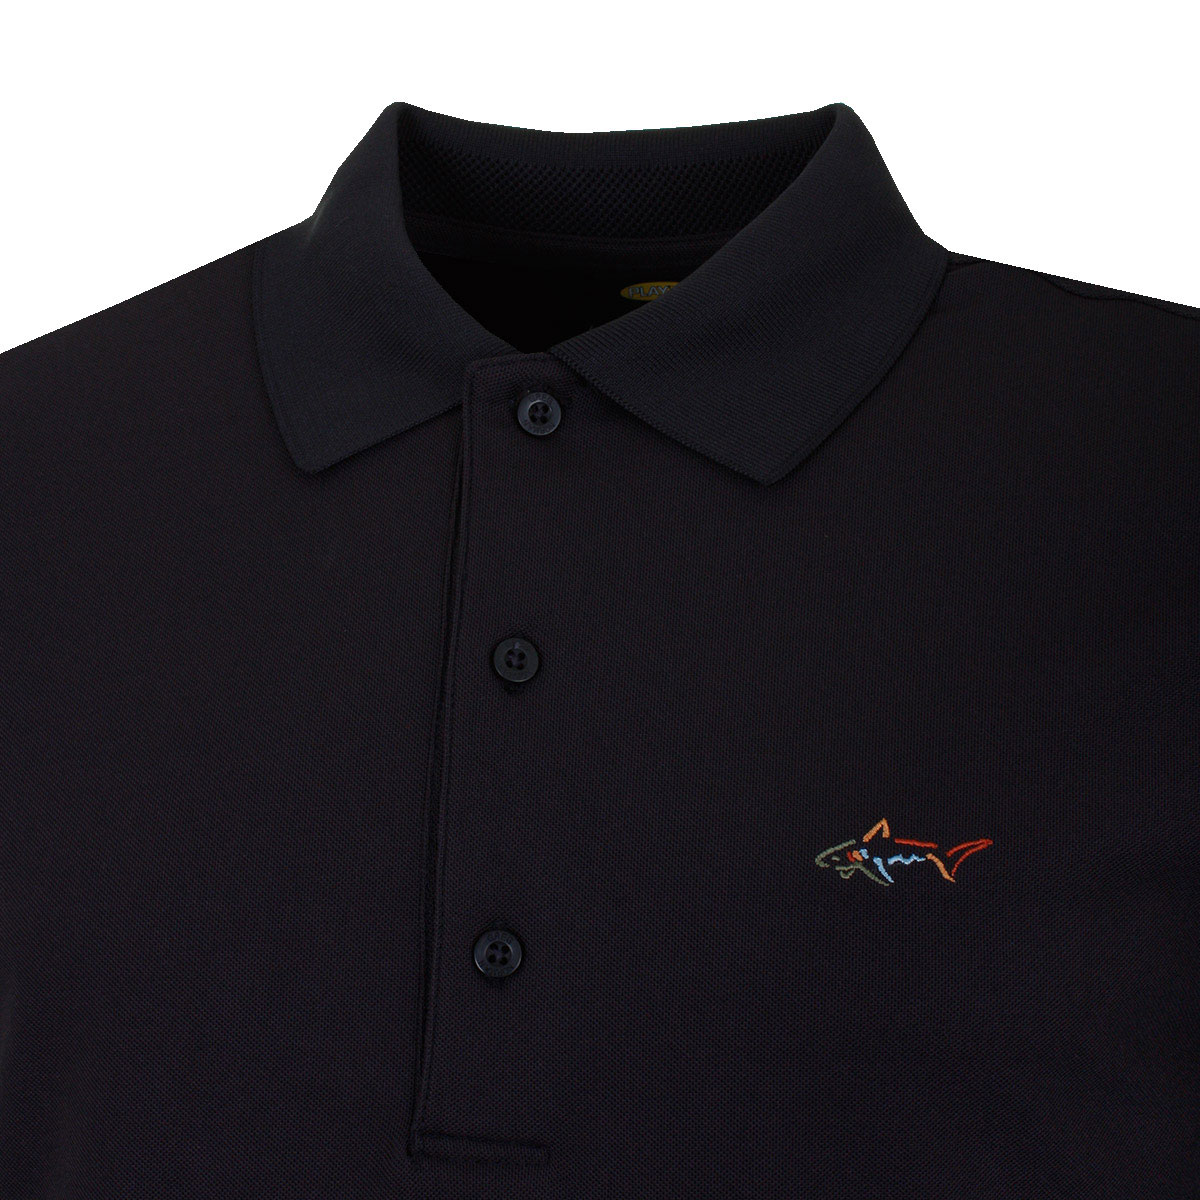 Greg-Norman-Mens-KX04-Performance-Micro-Pique-Golf-Polo-Shirt-28-OFF-RRP thumbnail 12